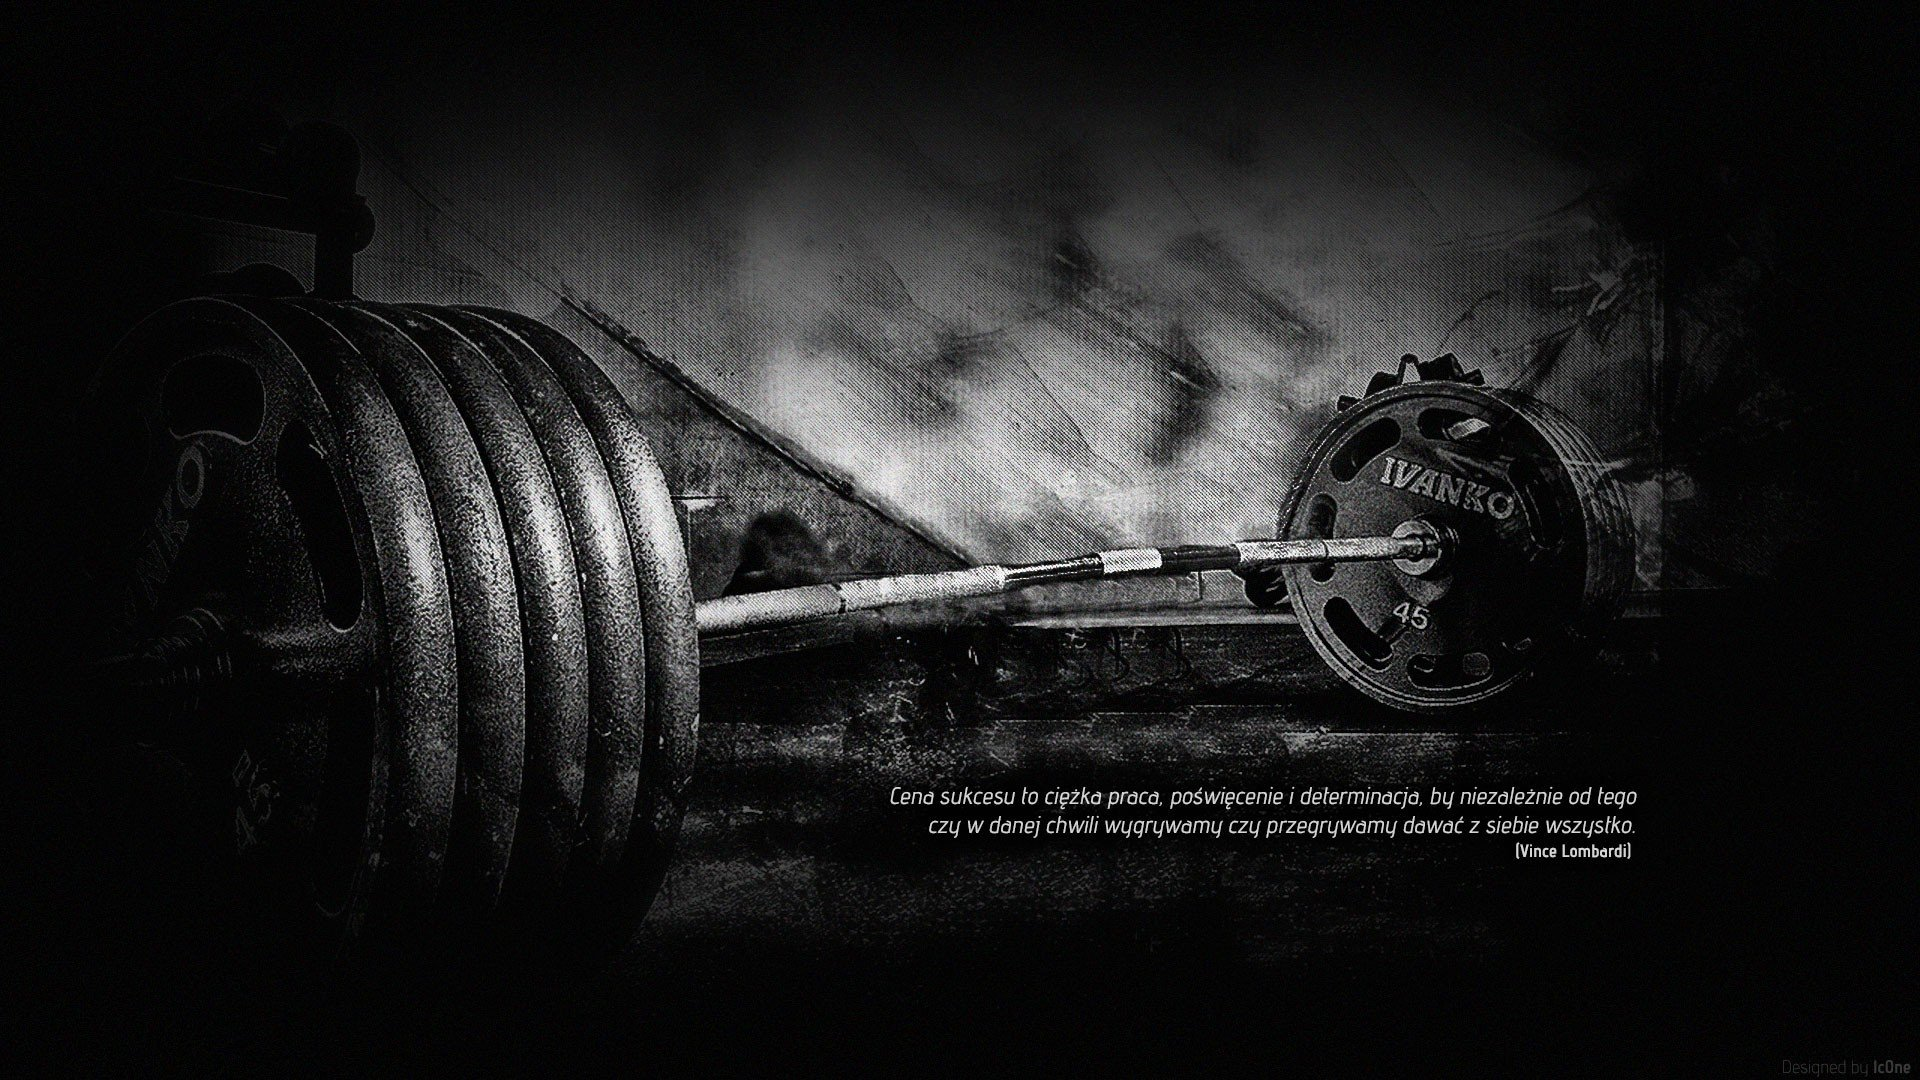 beast motivation most popular wallpapers 1920x1080